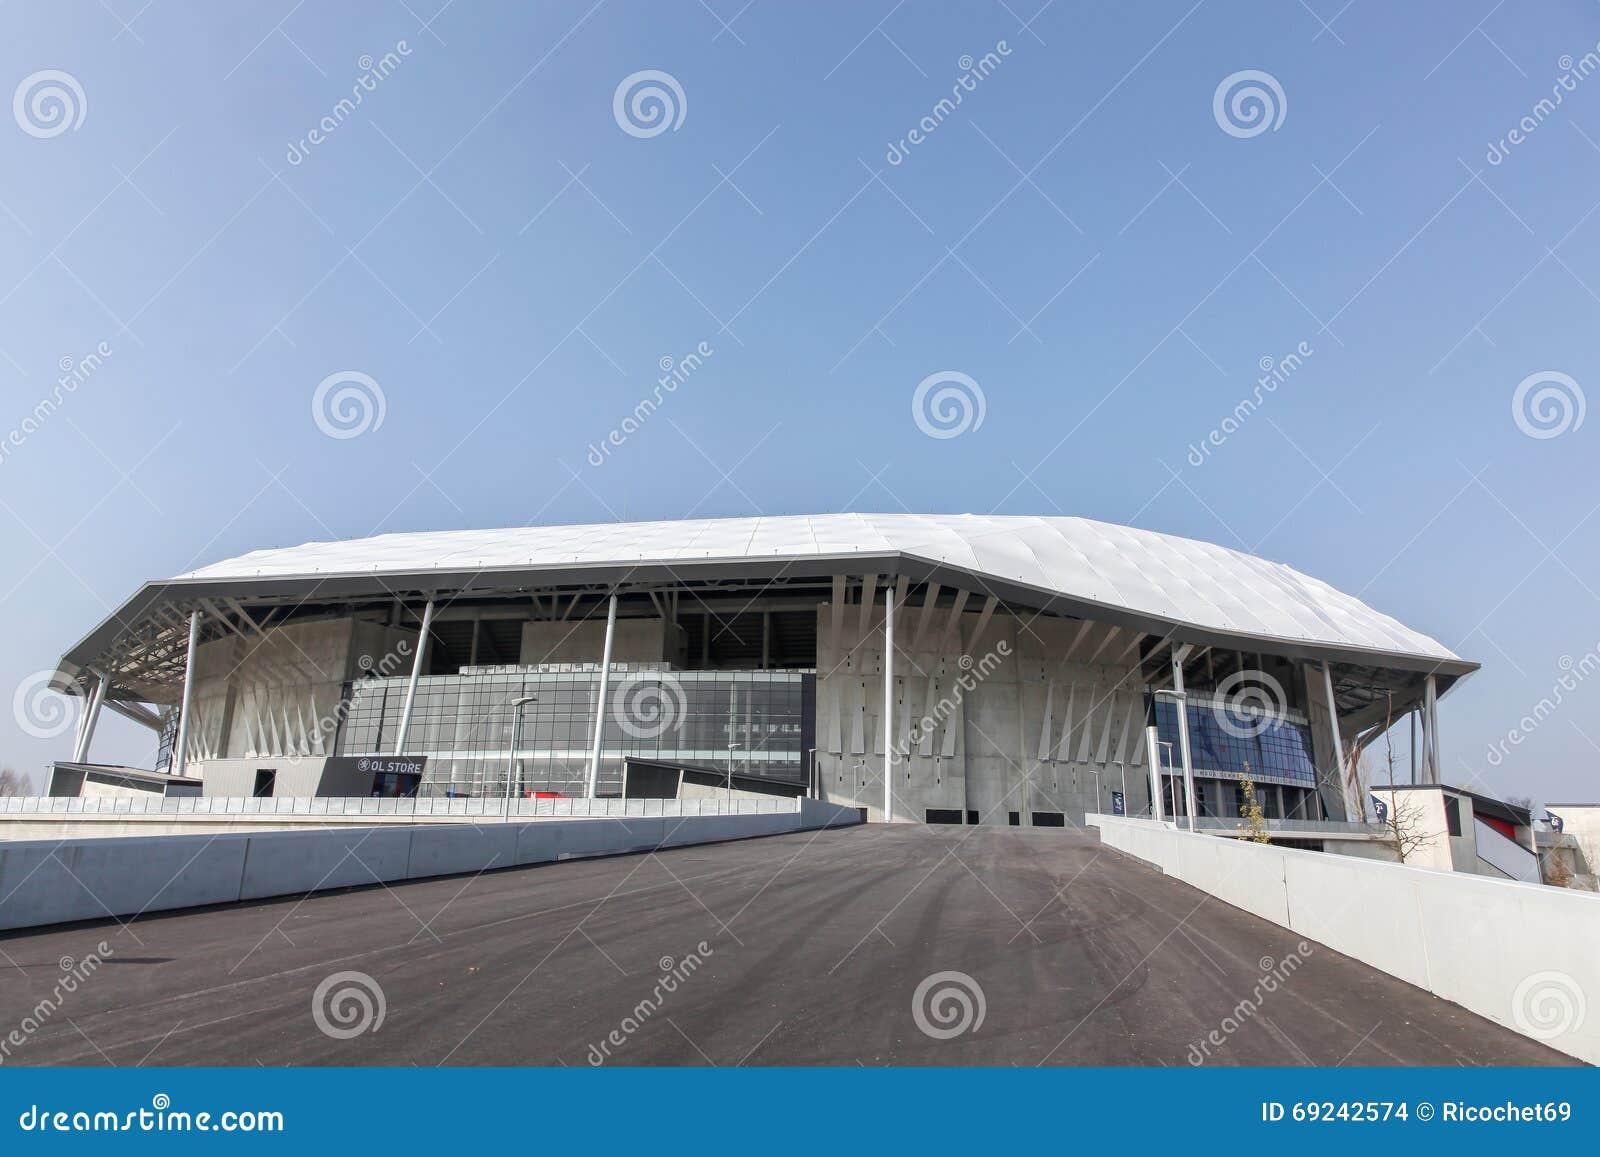 The parc olympique stadium in lyon france editorial stock for Club de natation piscine parc olympique